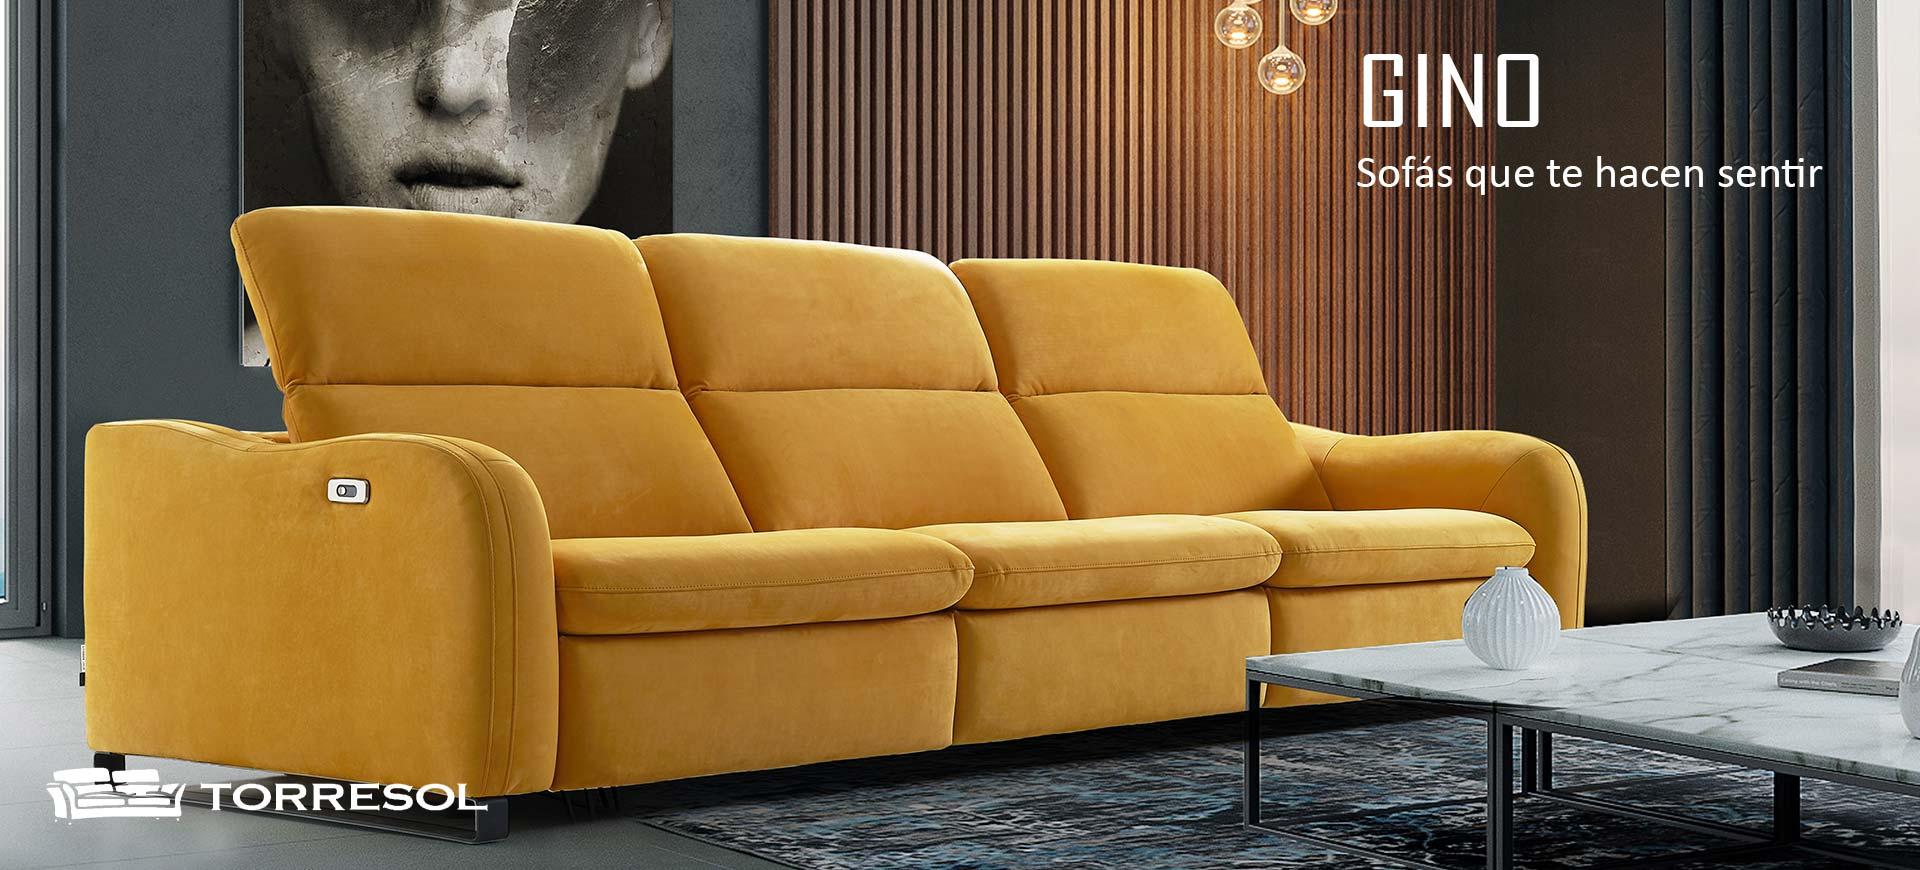 Sofa gino torresol12